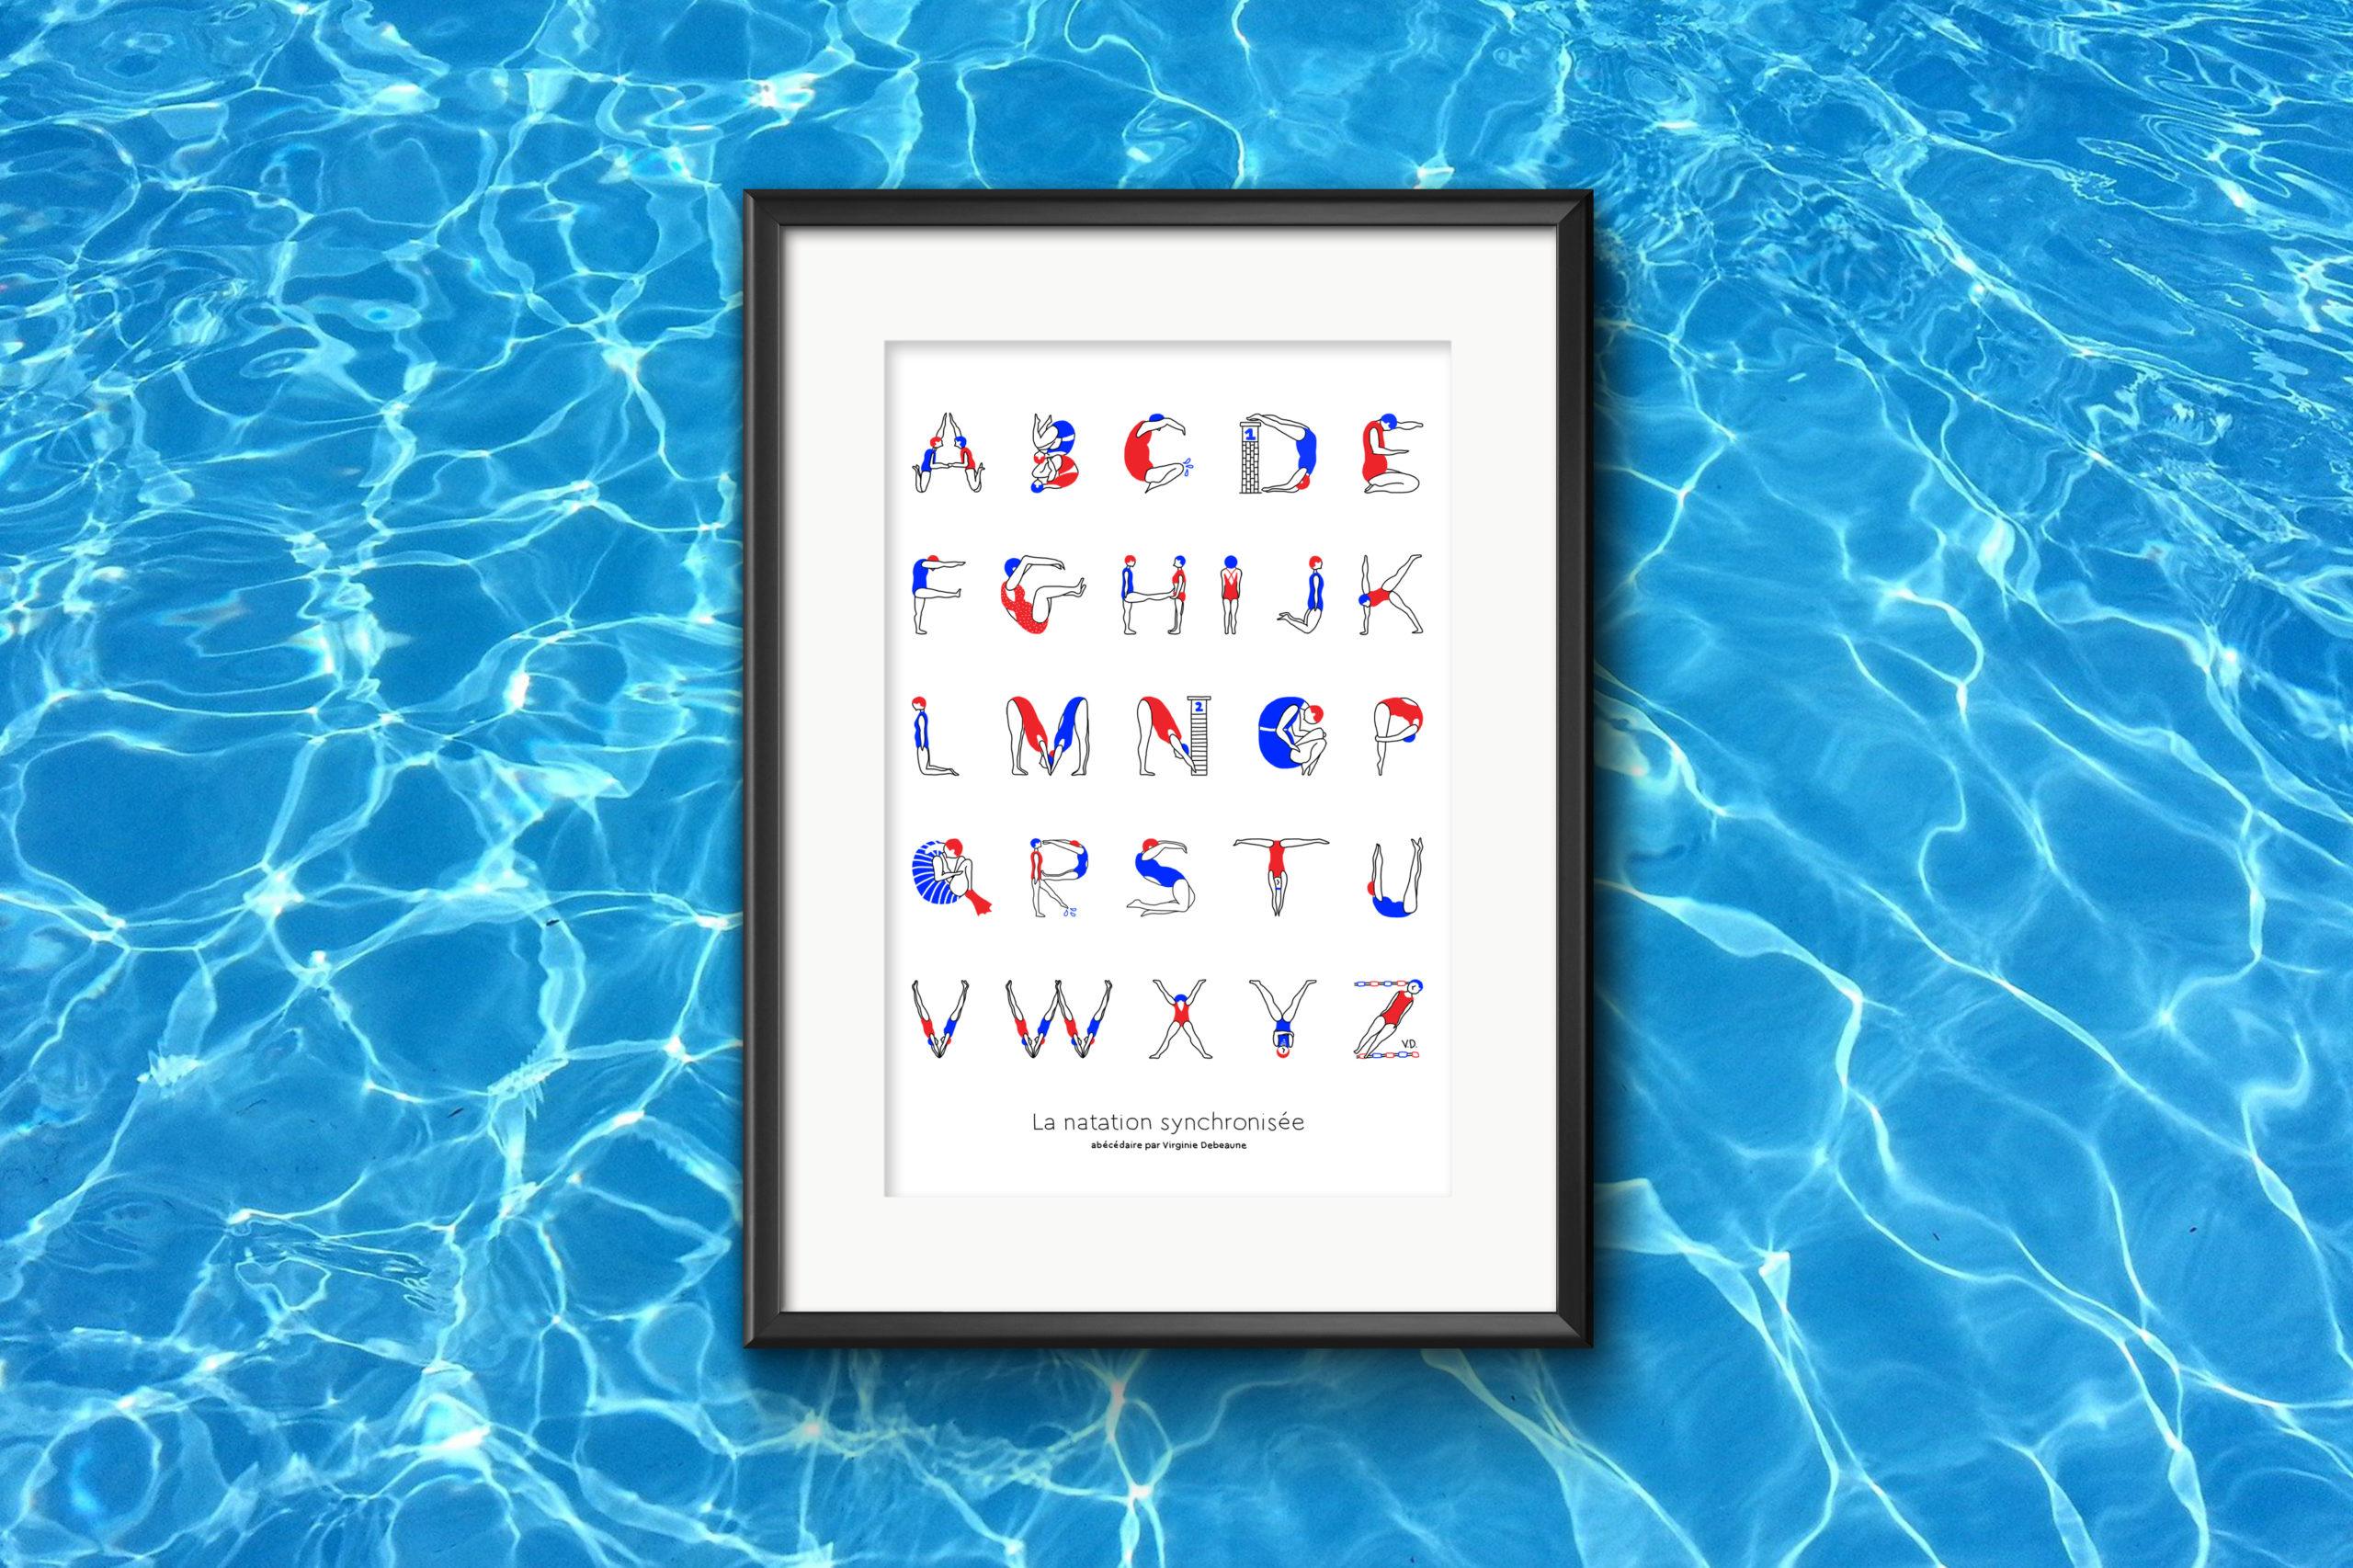 Poster-Frame-PSD-MockUp-2